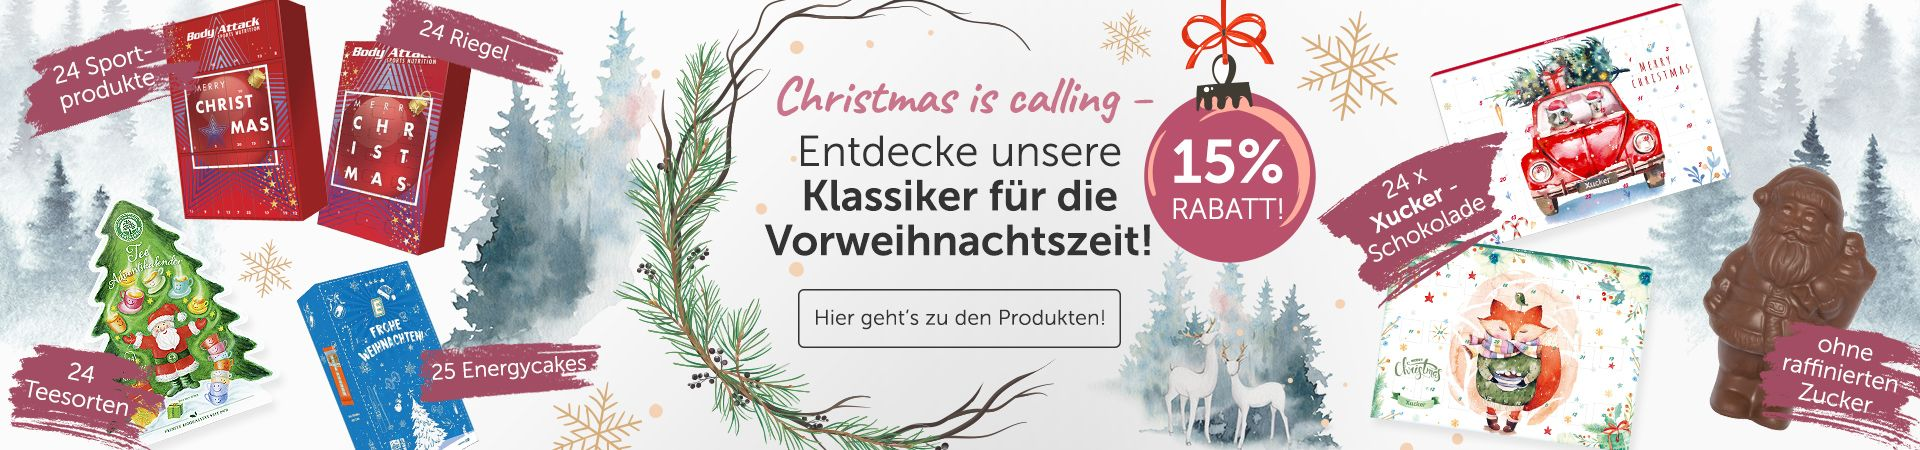 20181109_Weihnachtsaktion_15proz